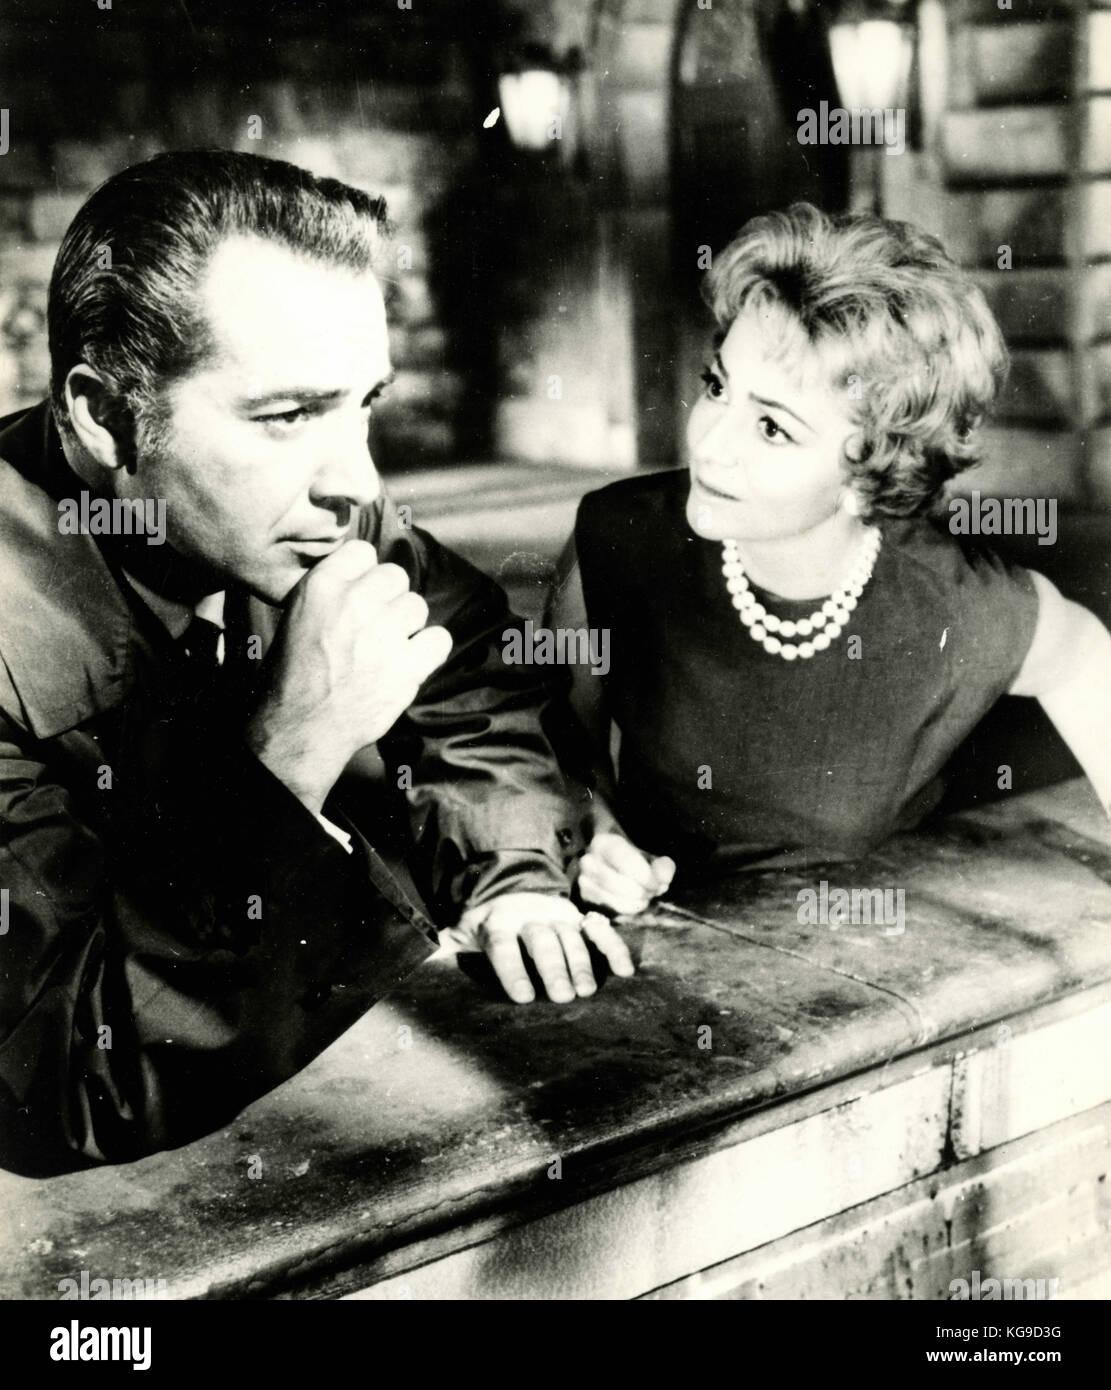 Actors Olivia De Havilland and Rossano Brazzi in the movie Light in the piazza, 1962 - Stock Image